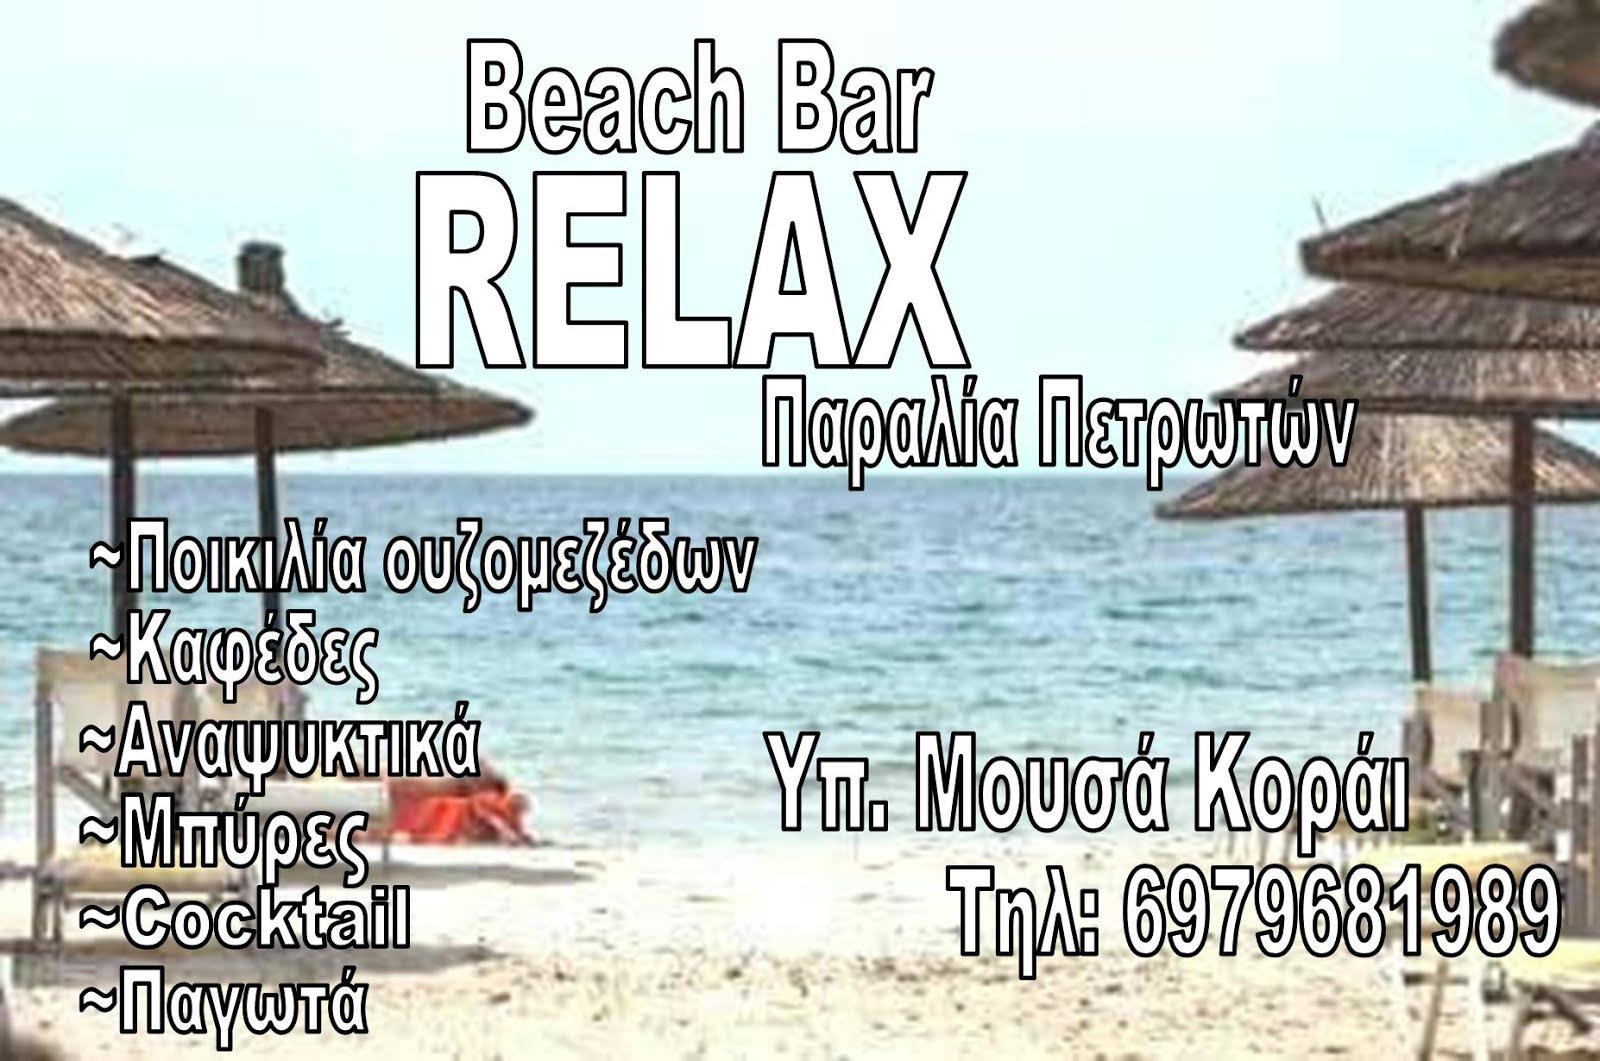 BEACH BAR RELAX